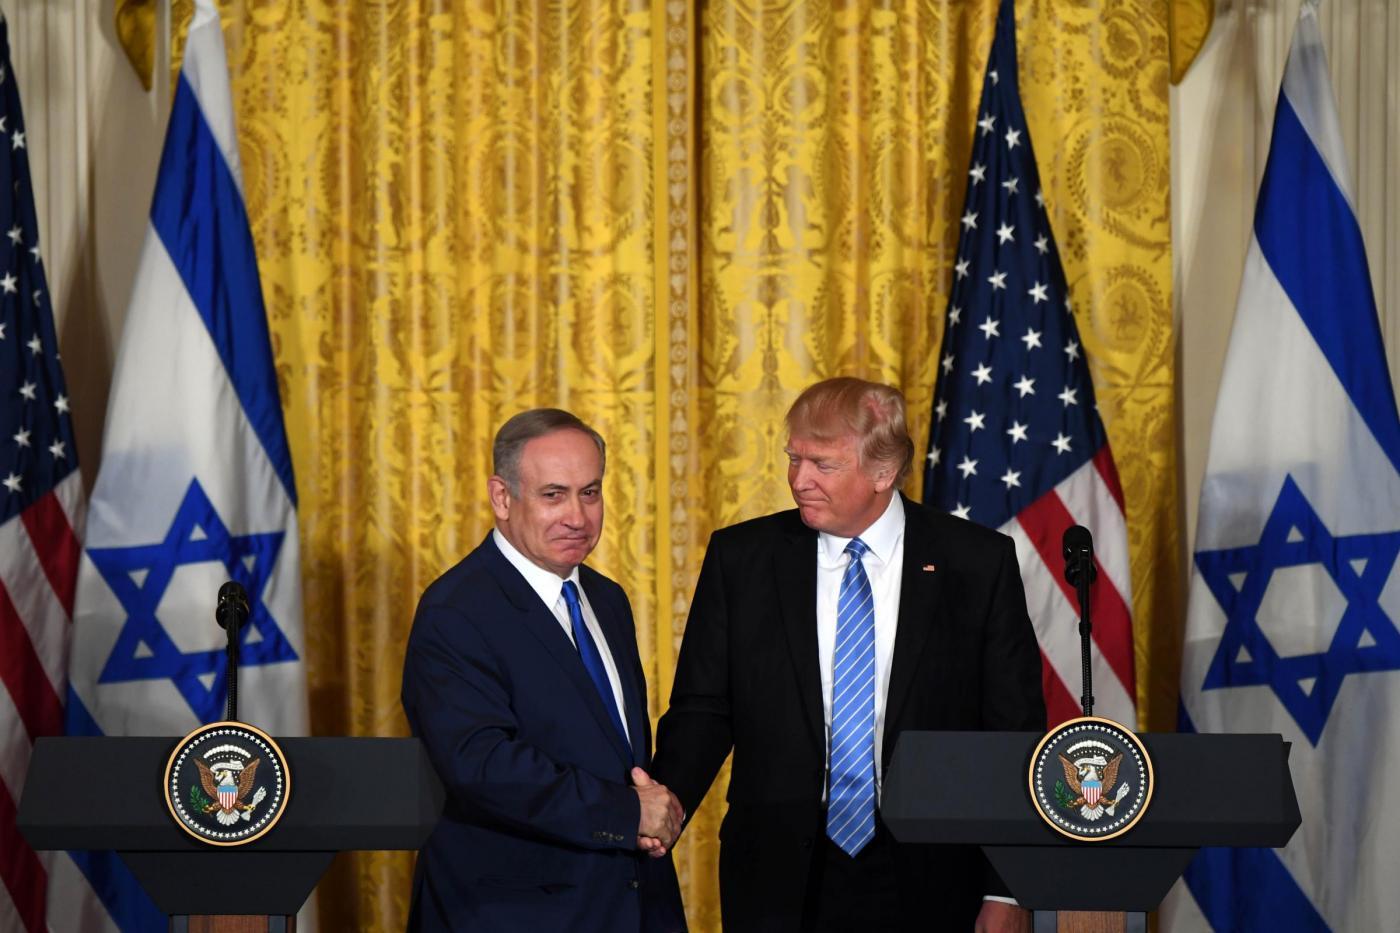 Usa, incontro Trump Netanyahu alla Casa Bianca